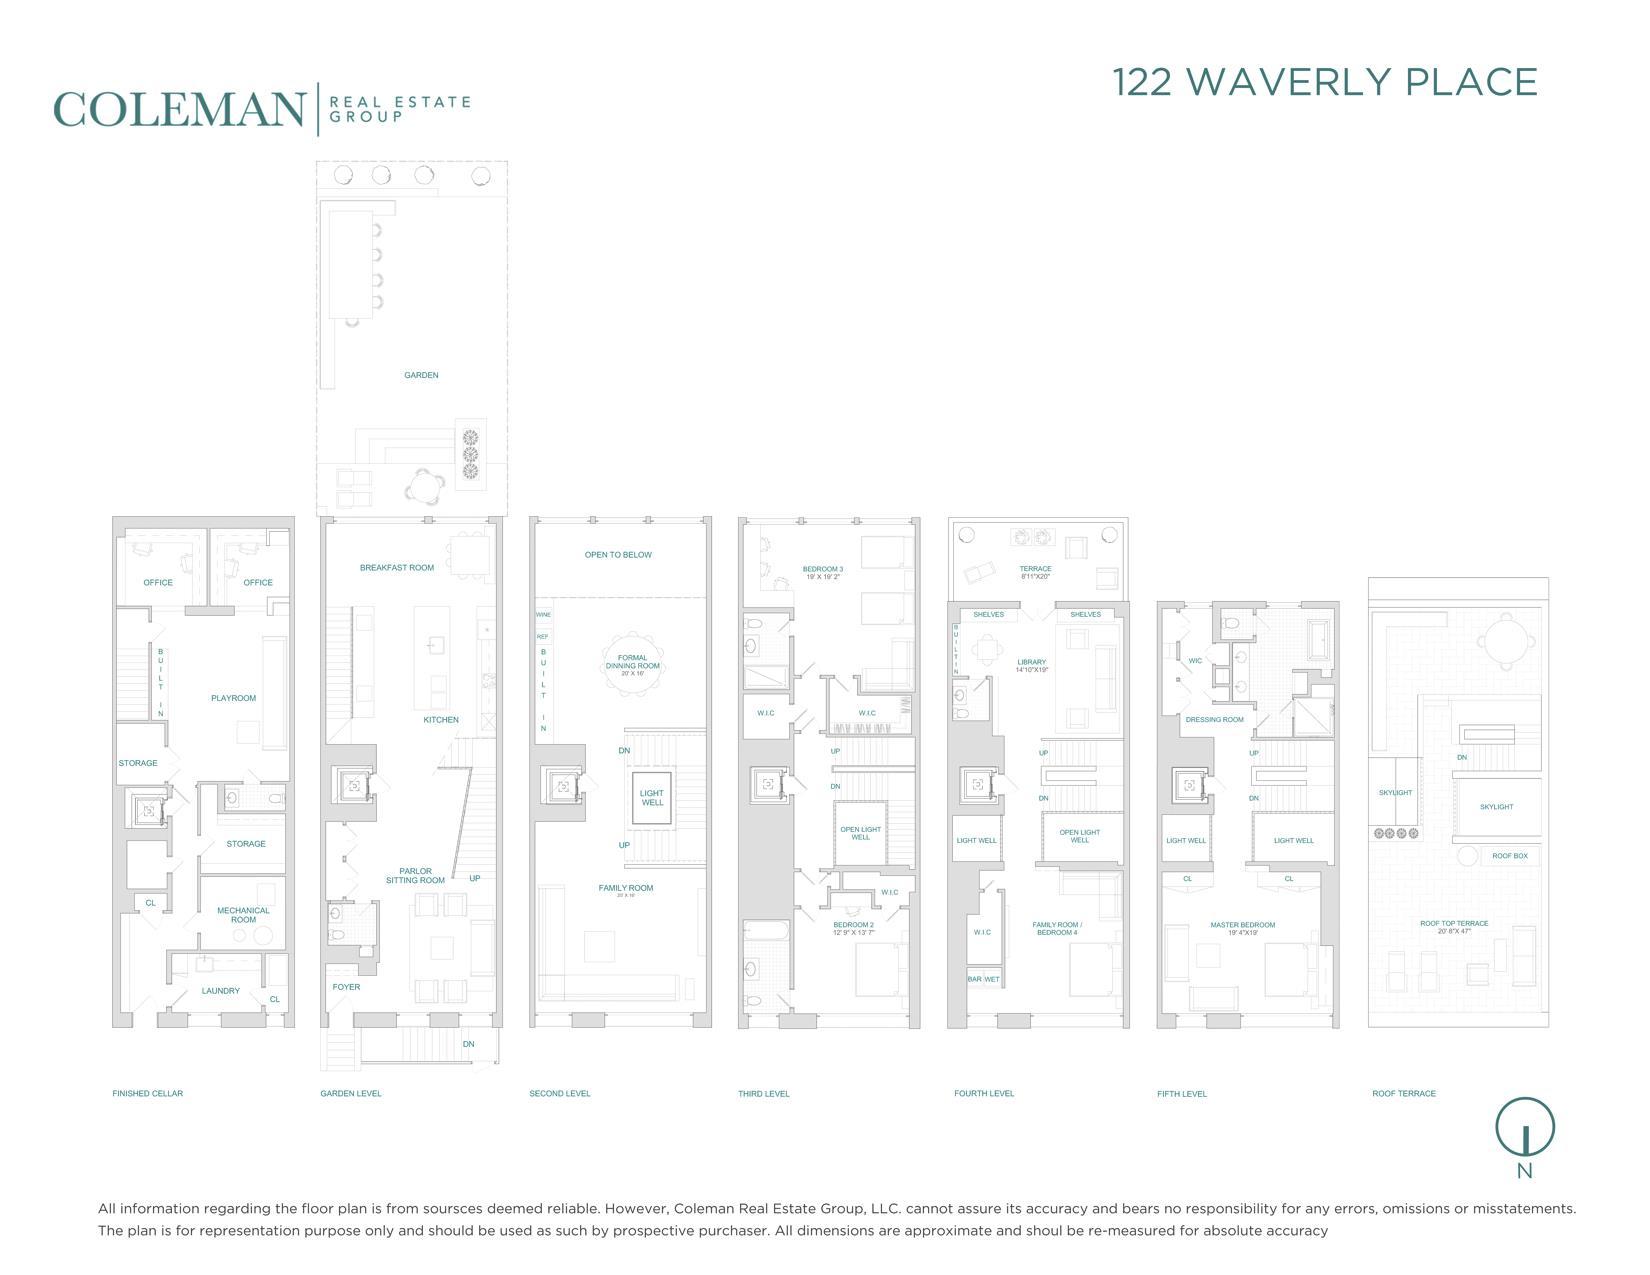 122 Waverly Place Greenwich Village New York NY 10011